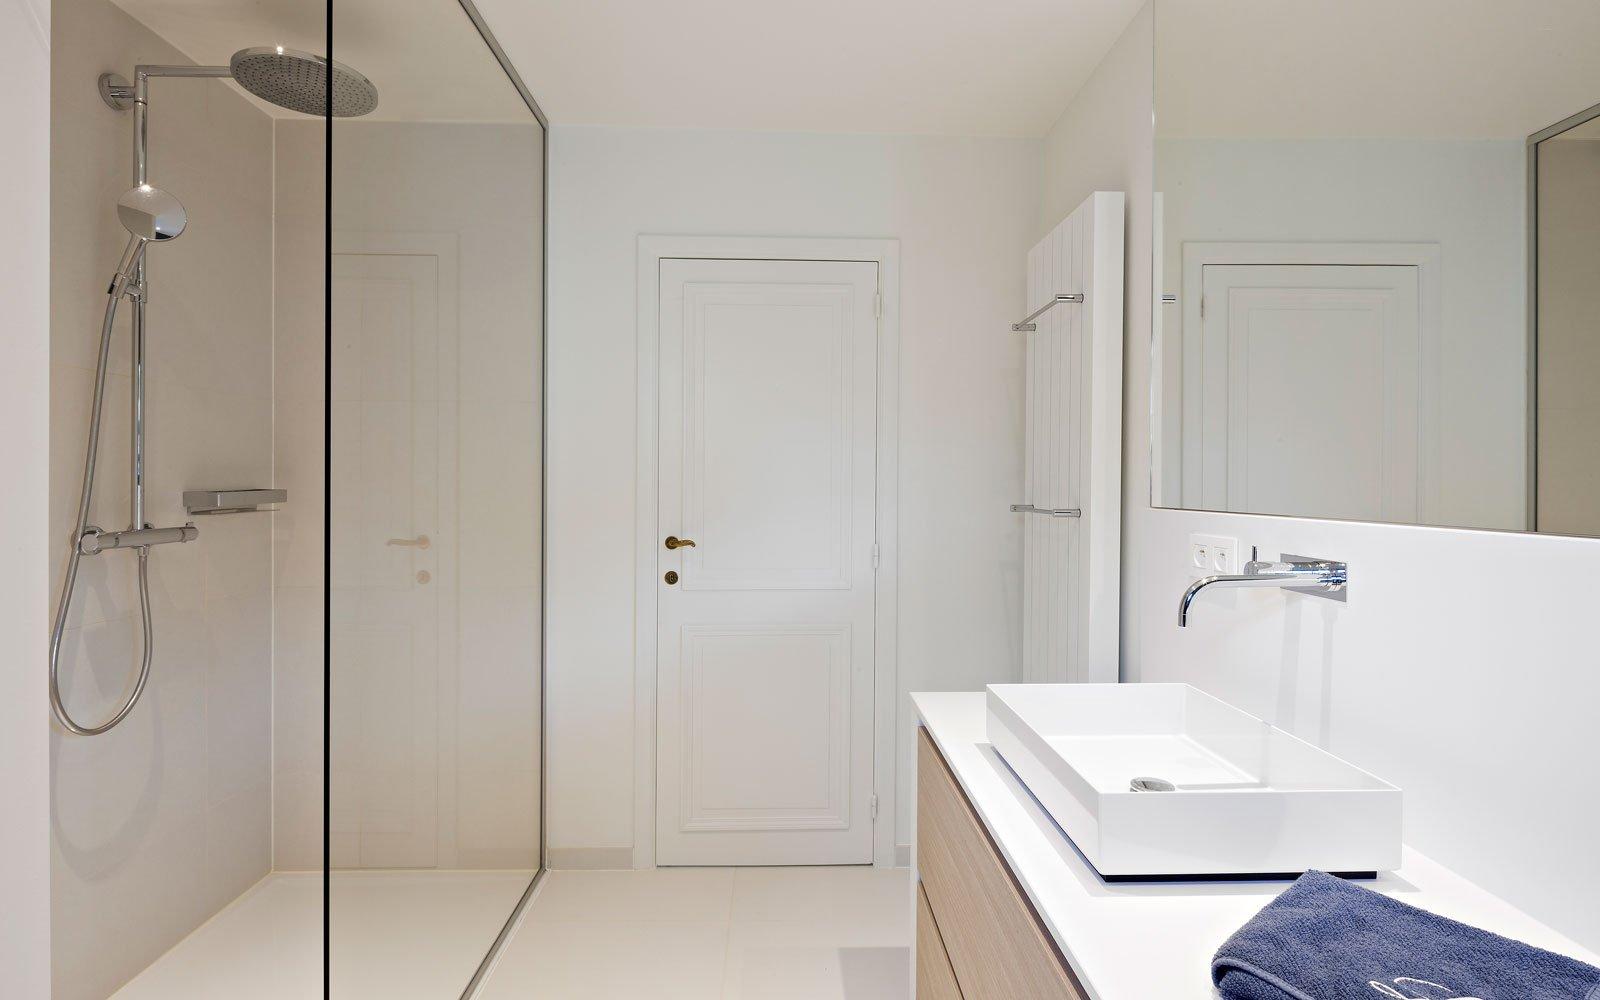 Badkamer, sanitair, regendouche, inloopdouche, glazen wand, klassieke villa, b+ villas